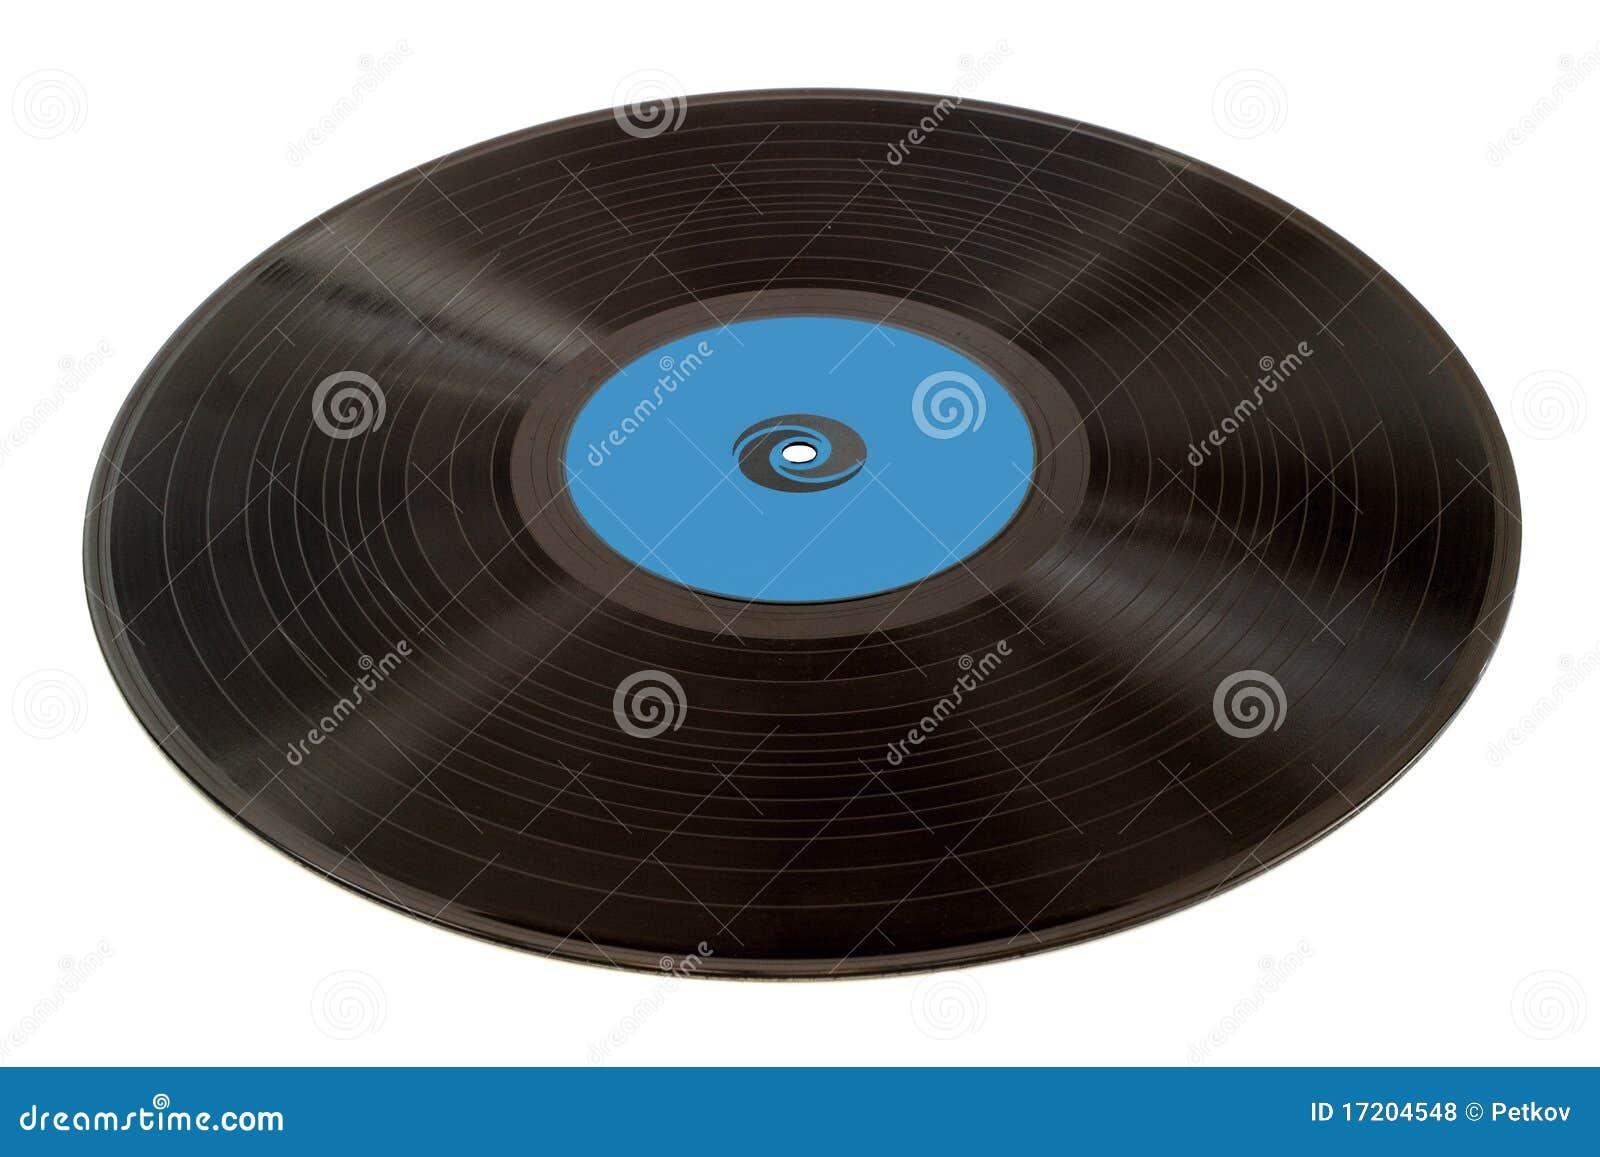 Old Vinyl Record Royalty Free Stock Photos Image 17204548